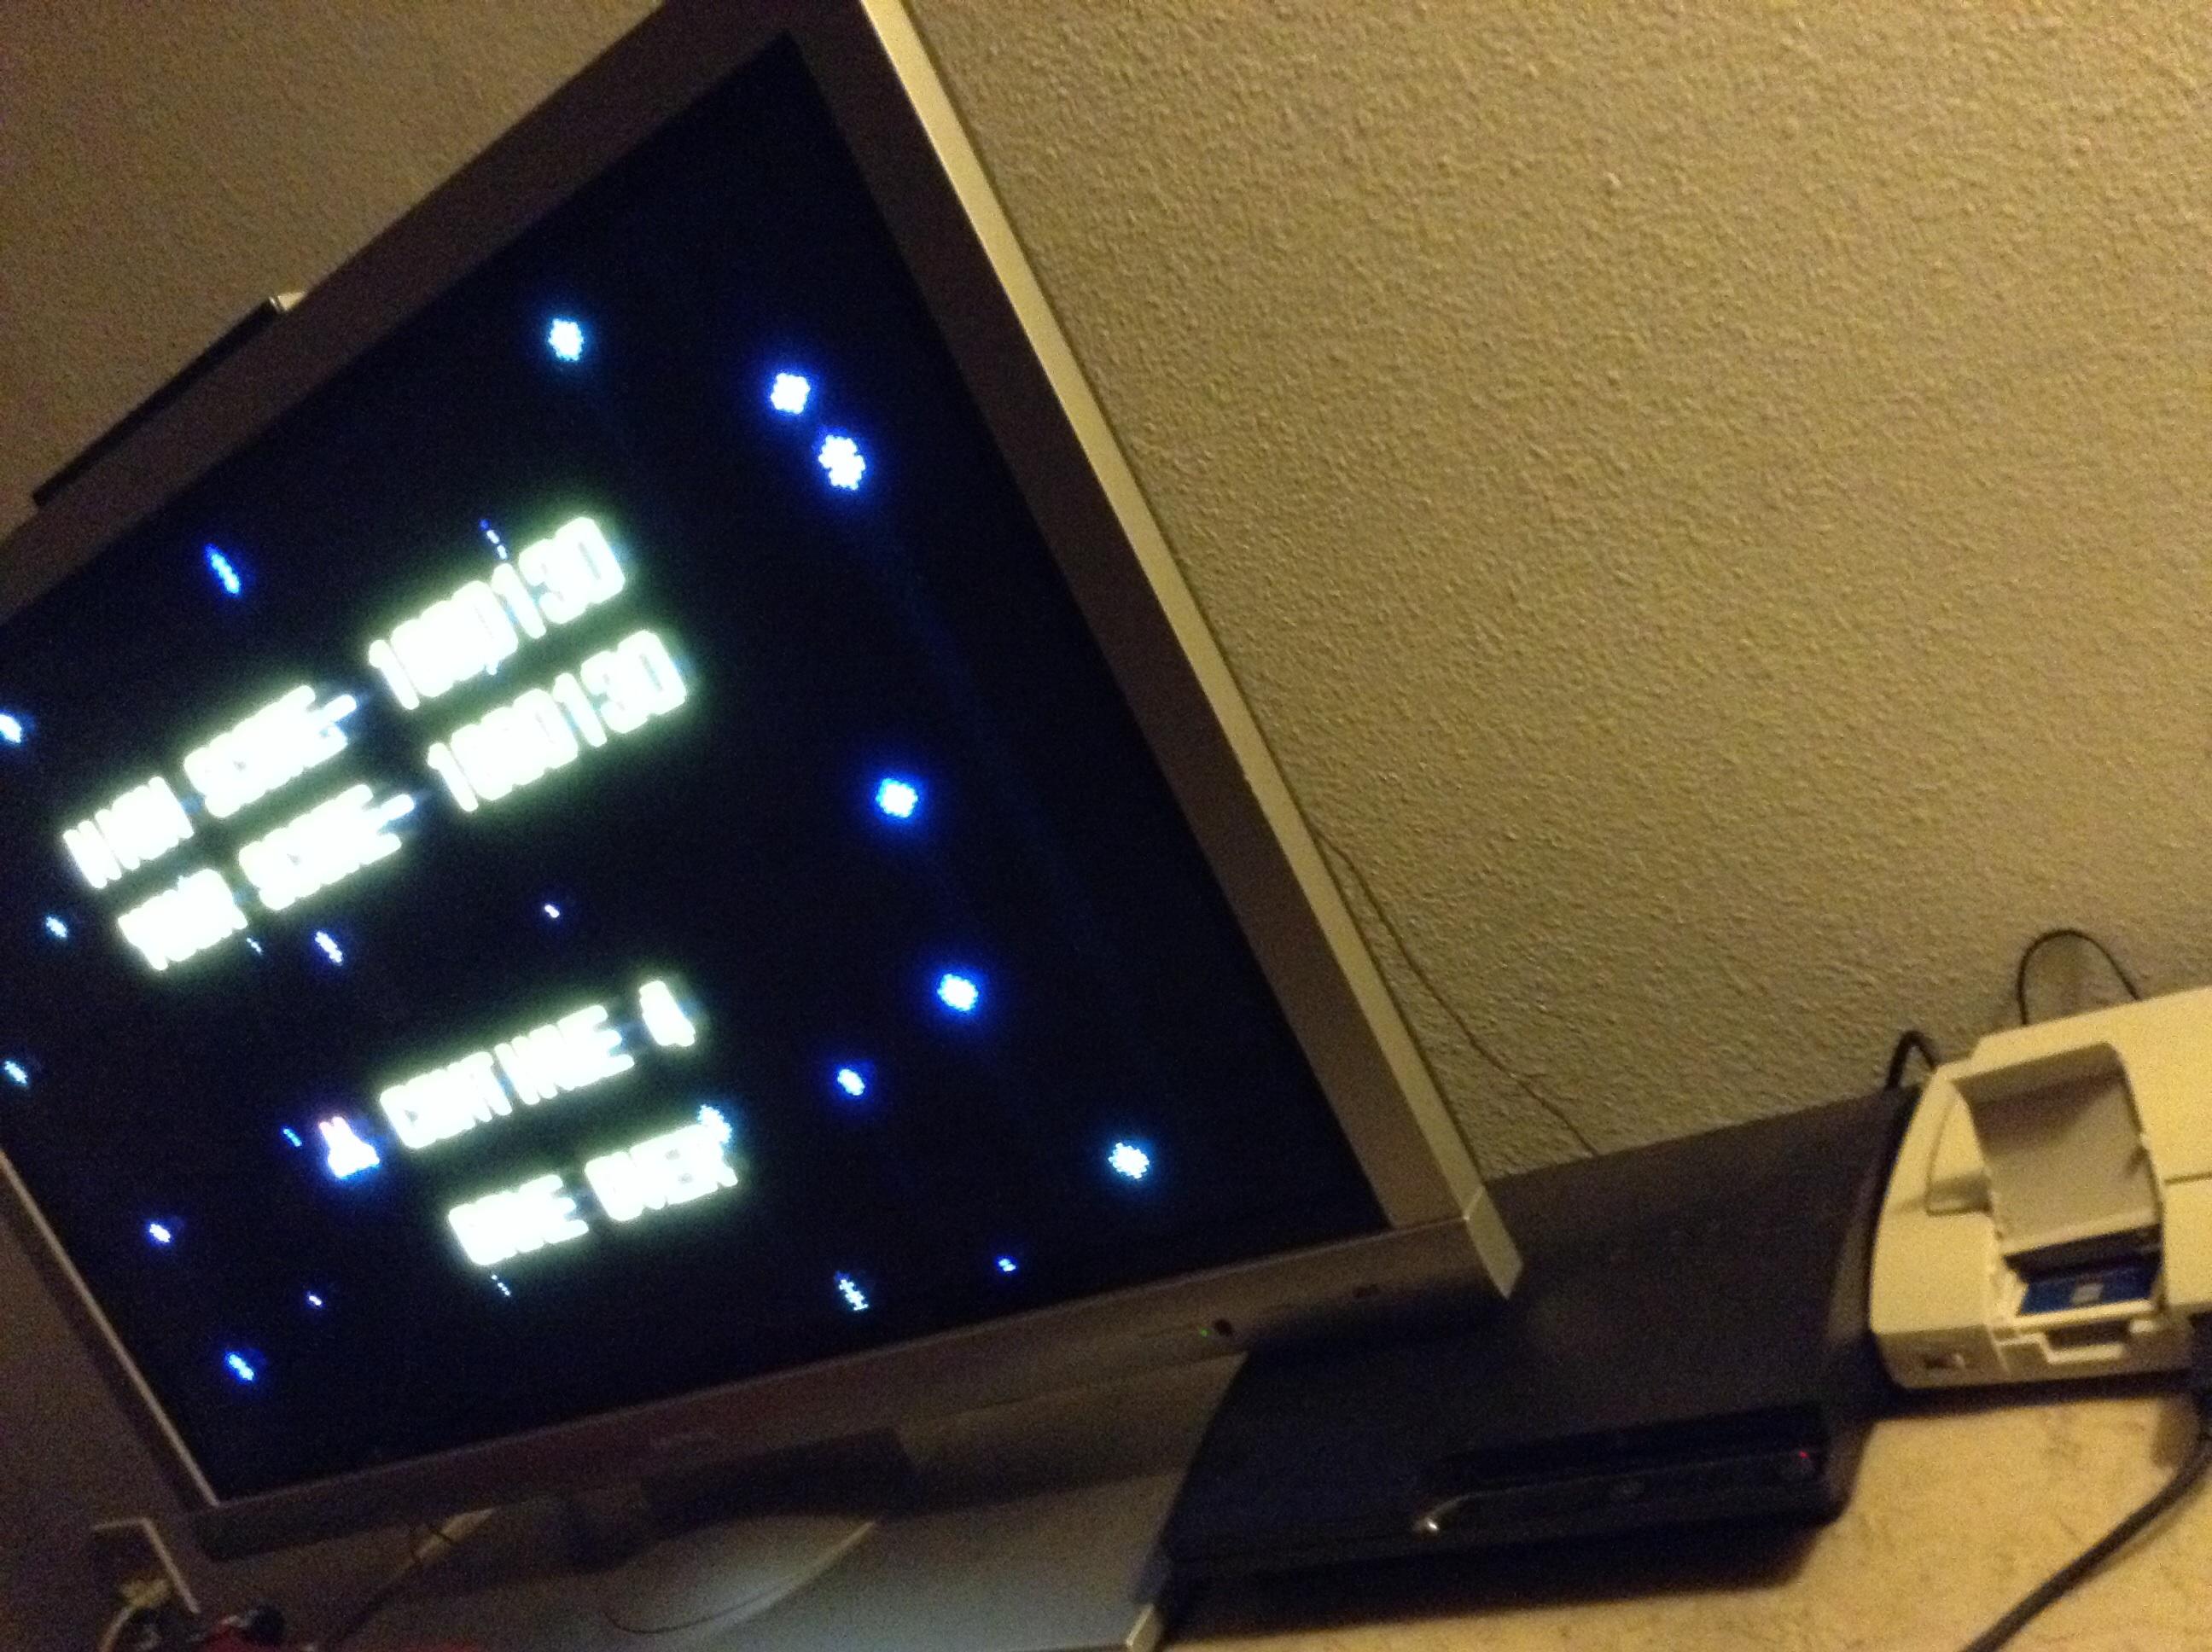 CID: Blazing Lazers (TurboGrafx-16/PC Engine) 1,860,130 points on 2014-09-03 23:58:46